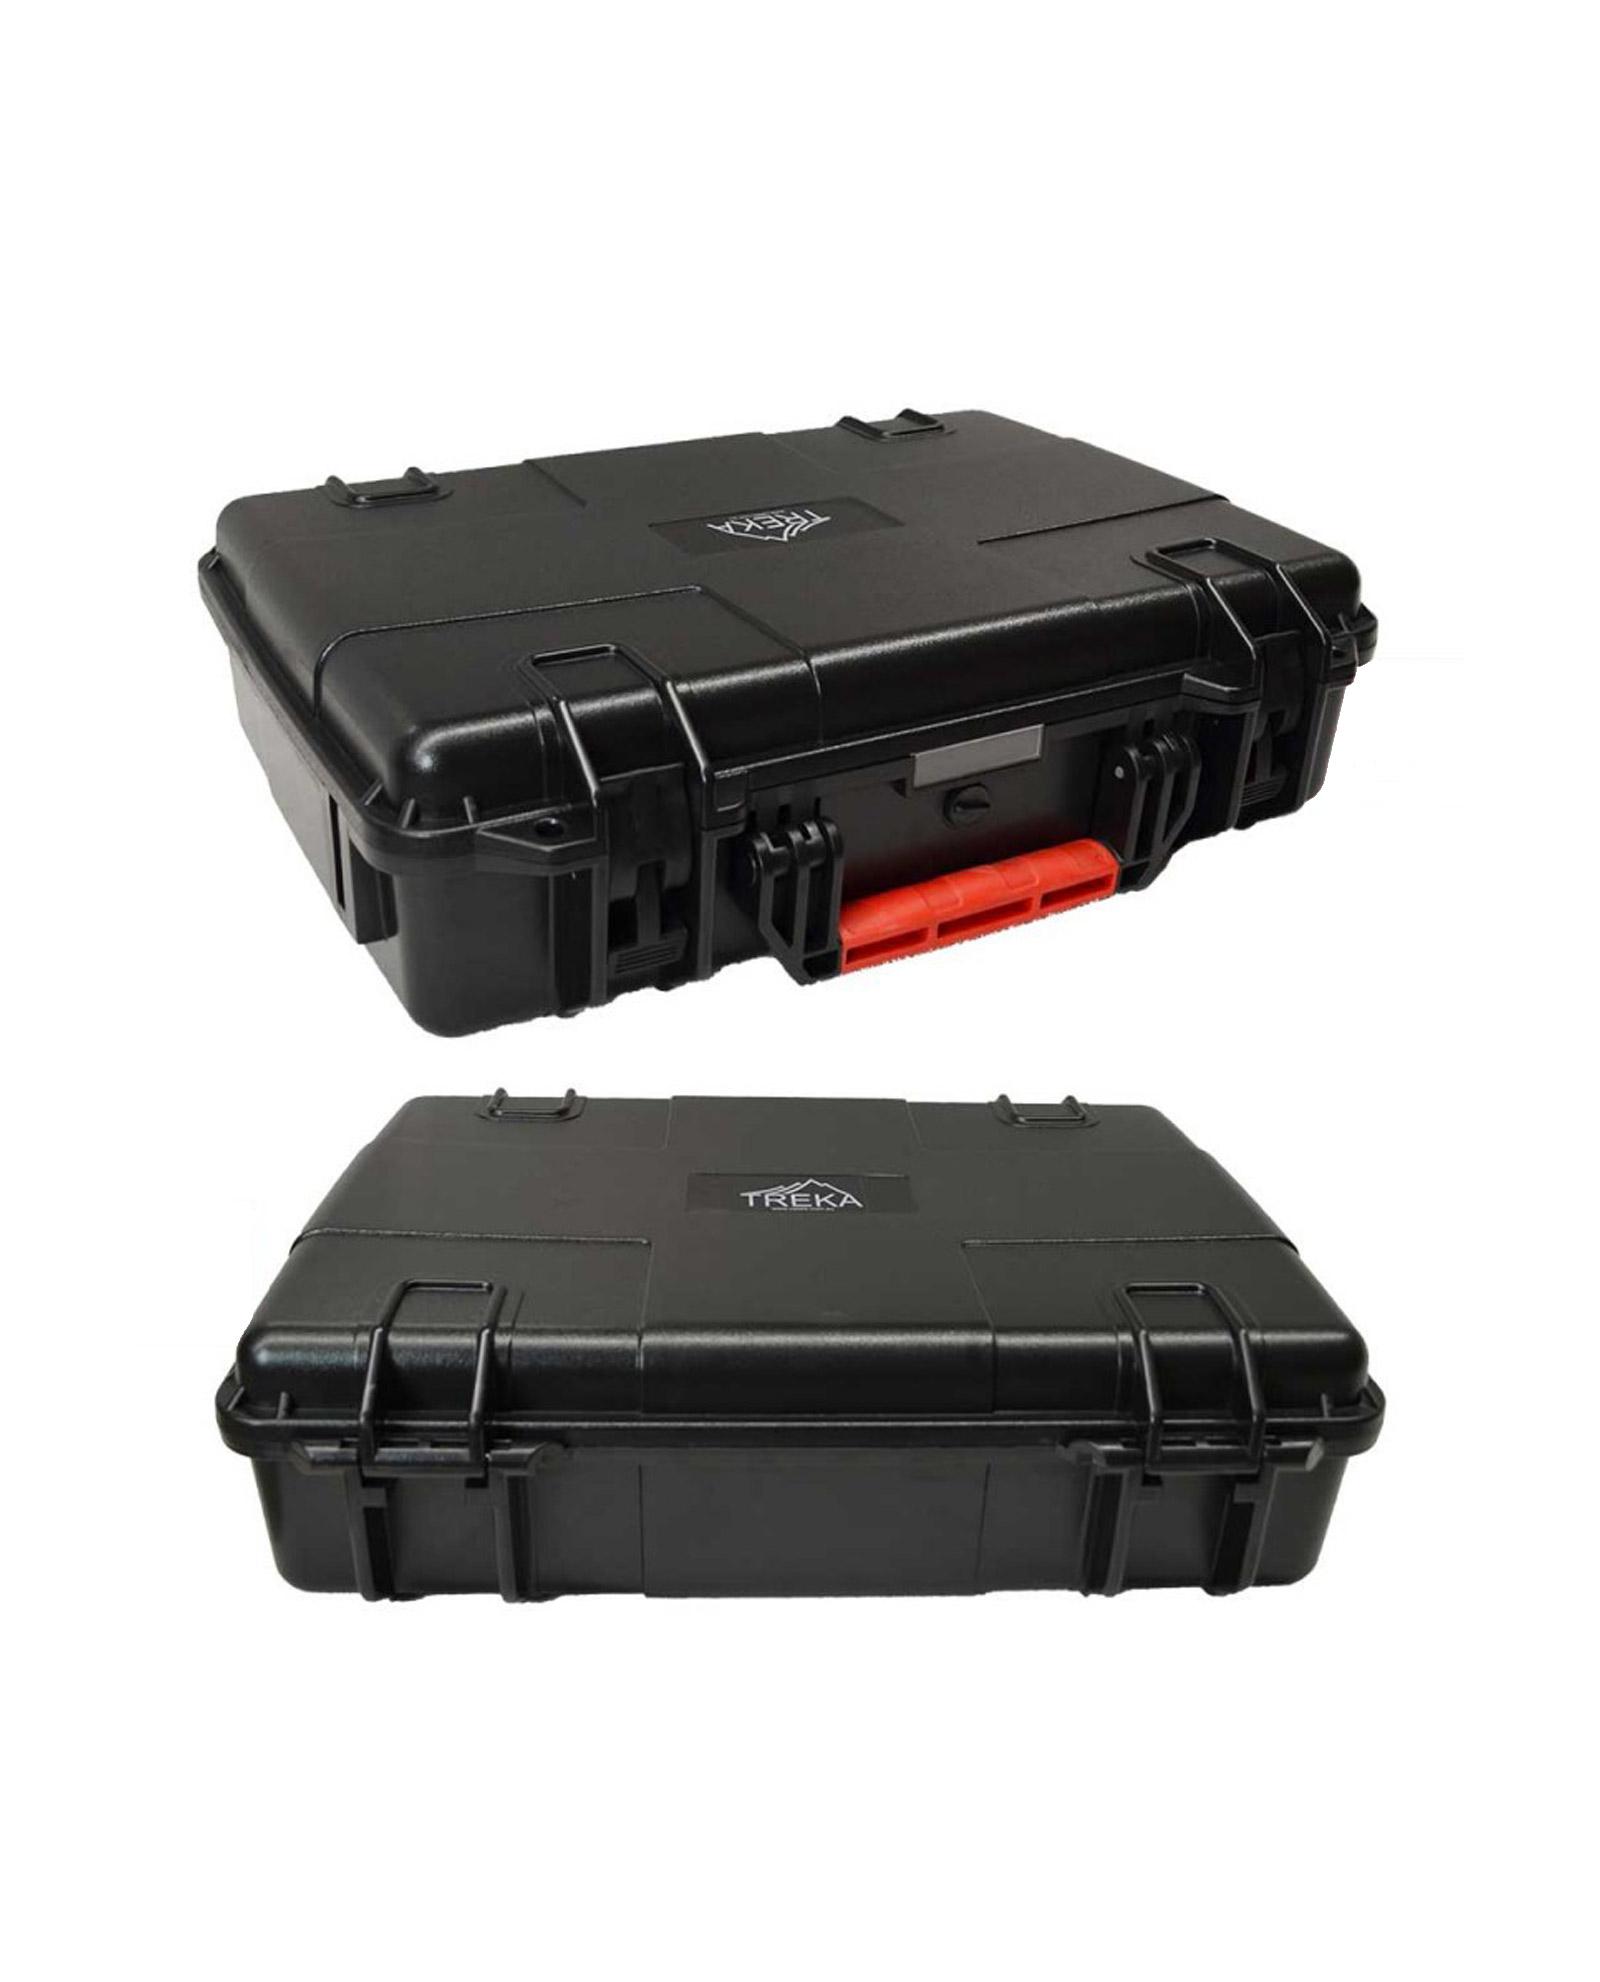 Treka 900 ABS Case